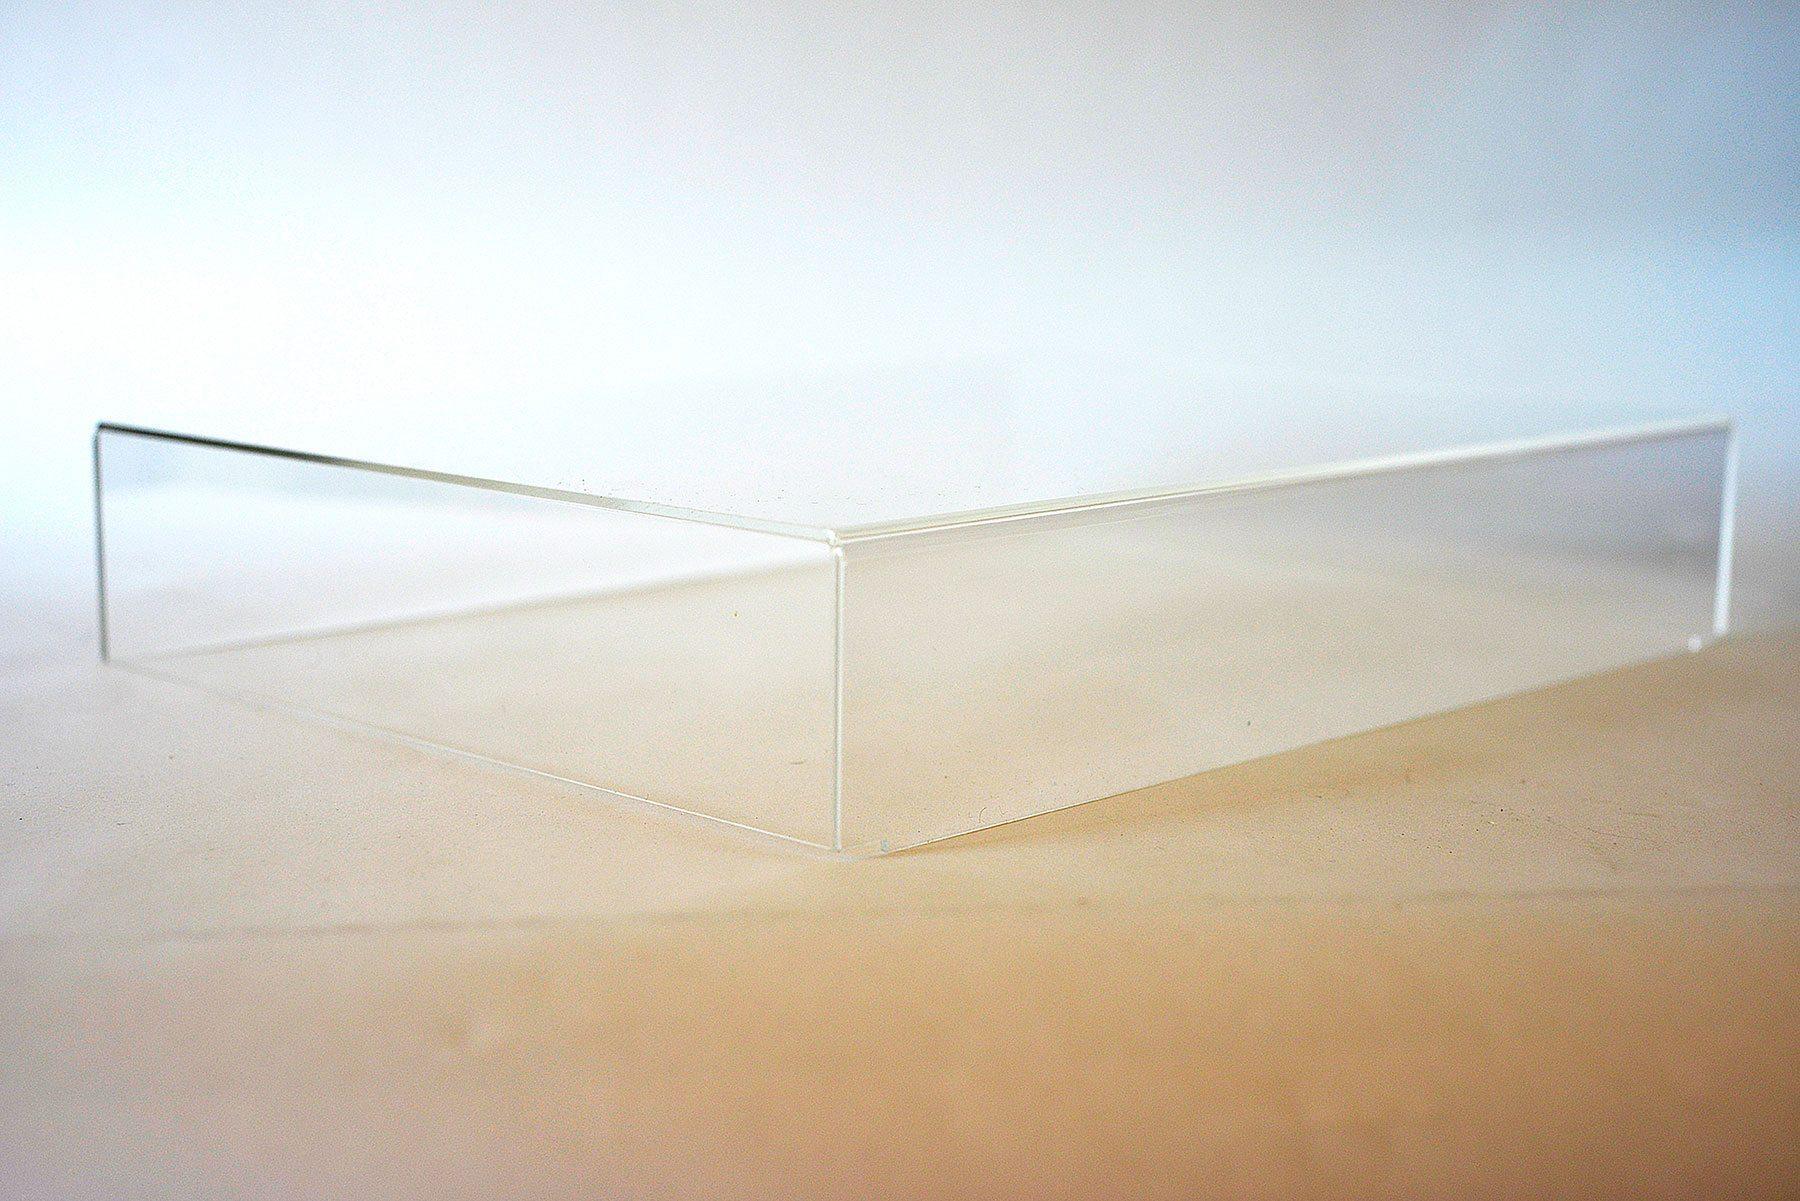 restaurierte thorens td 160 plattenspieler turntable mit jelco sa 750d tonarm ebay. Black Bedroom Furniture Sets. Home Design Ideas